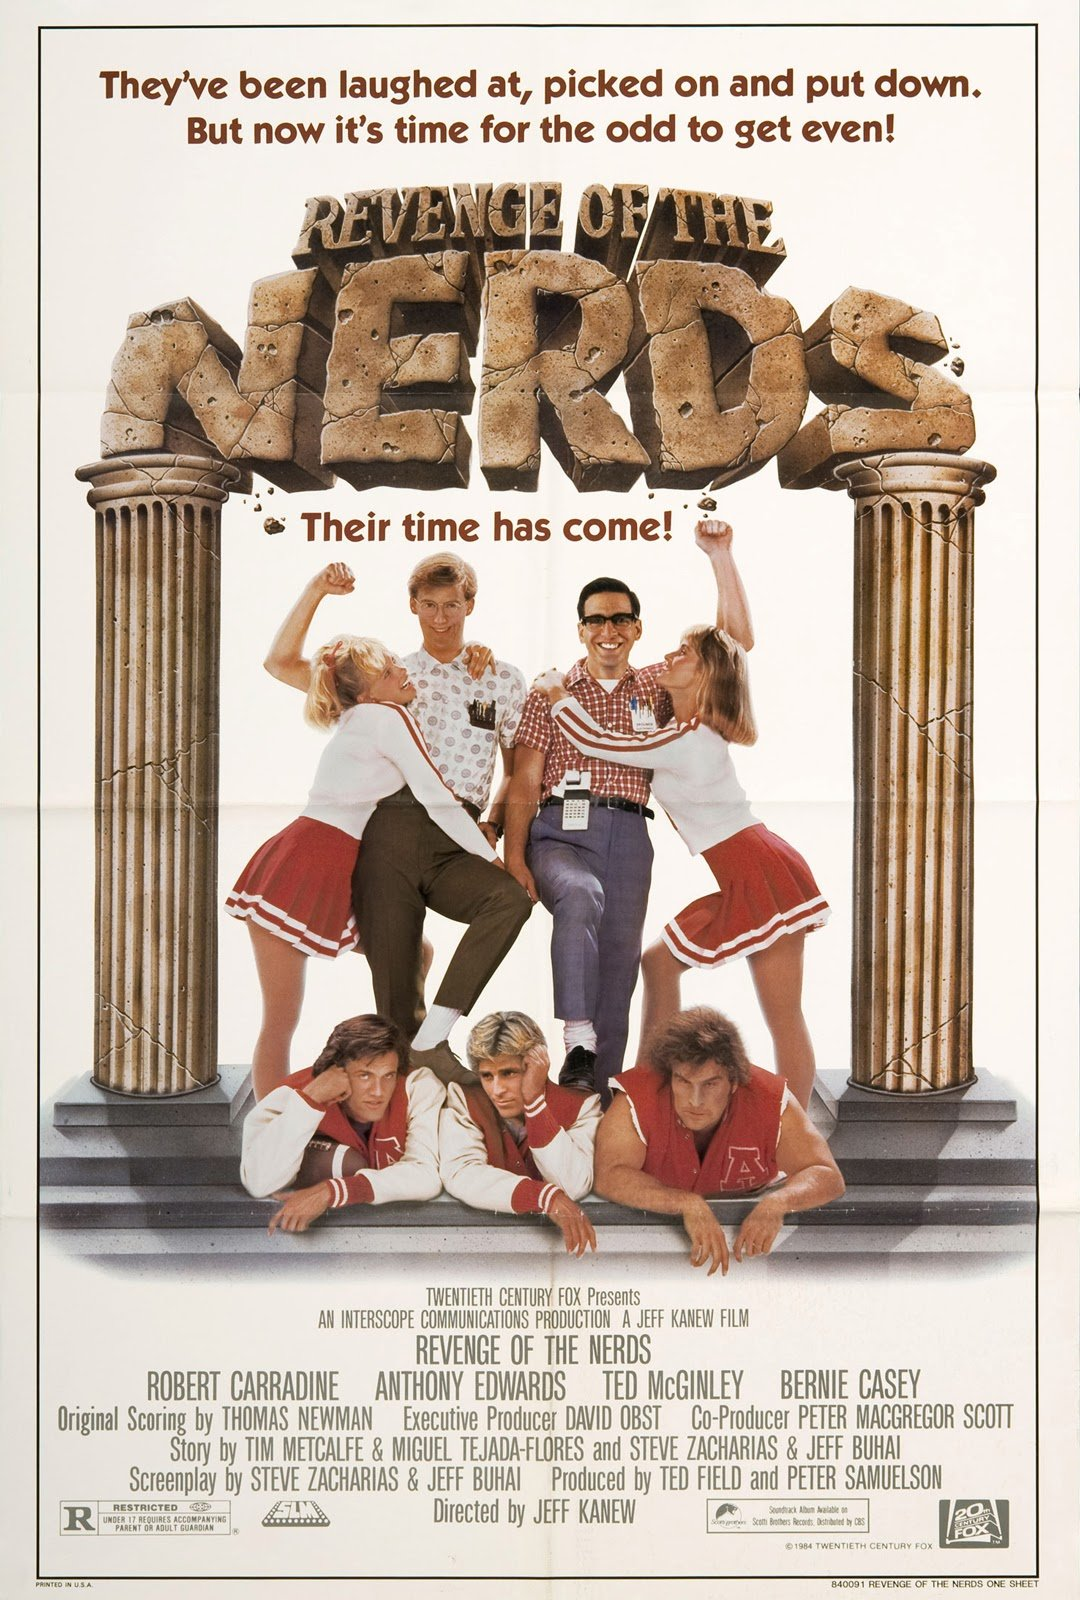 photo Revenge of the nerds remake gets binned